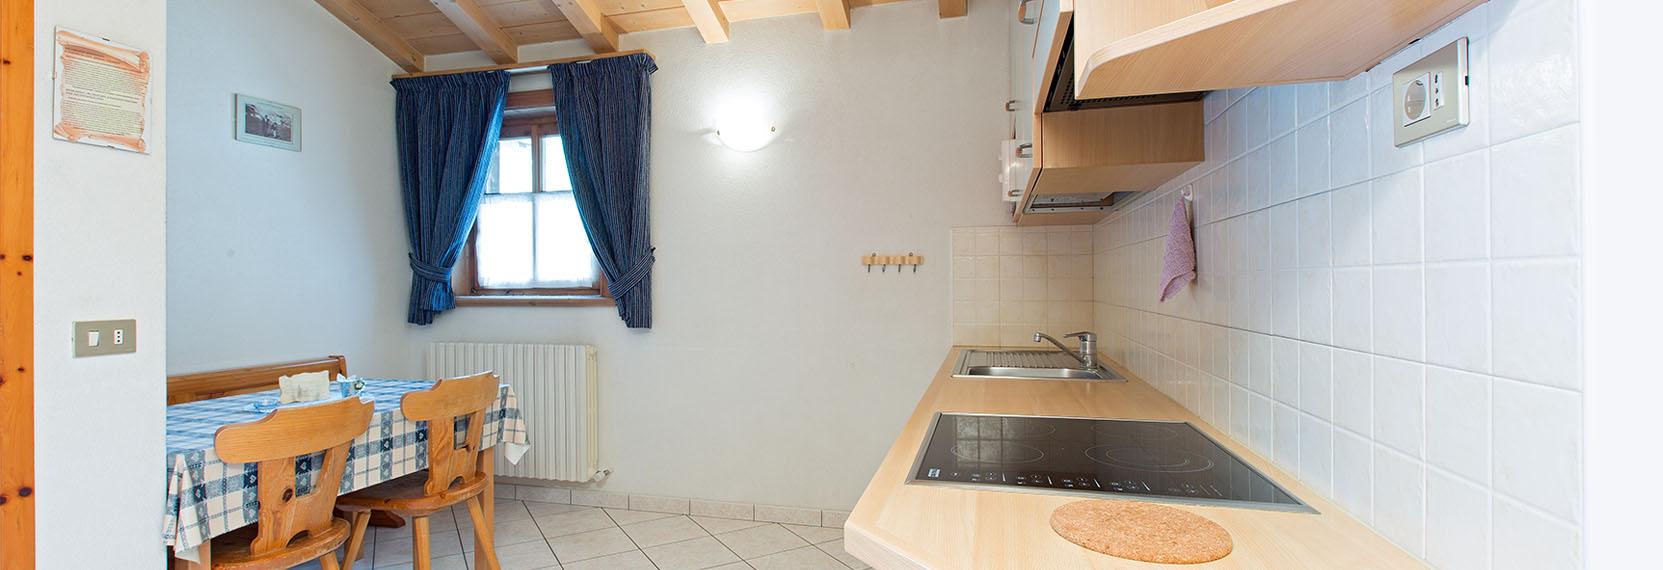 Appartamento blu di Bait Vegl a Livigno